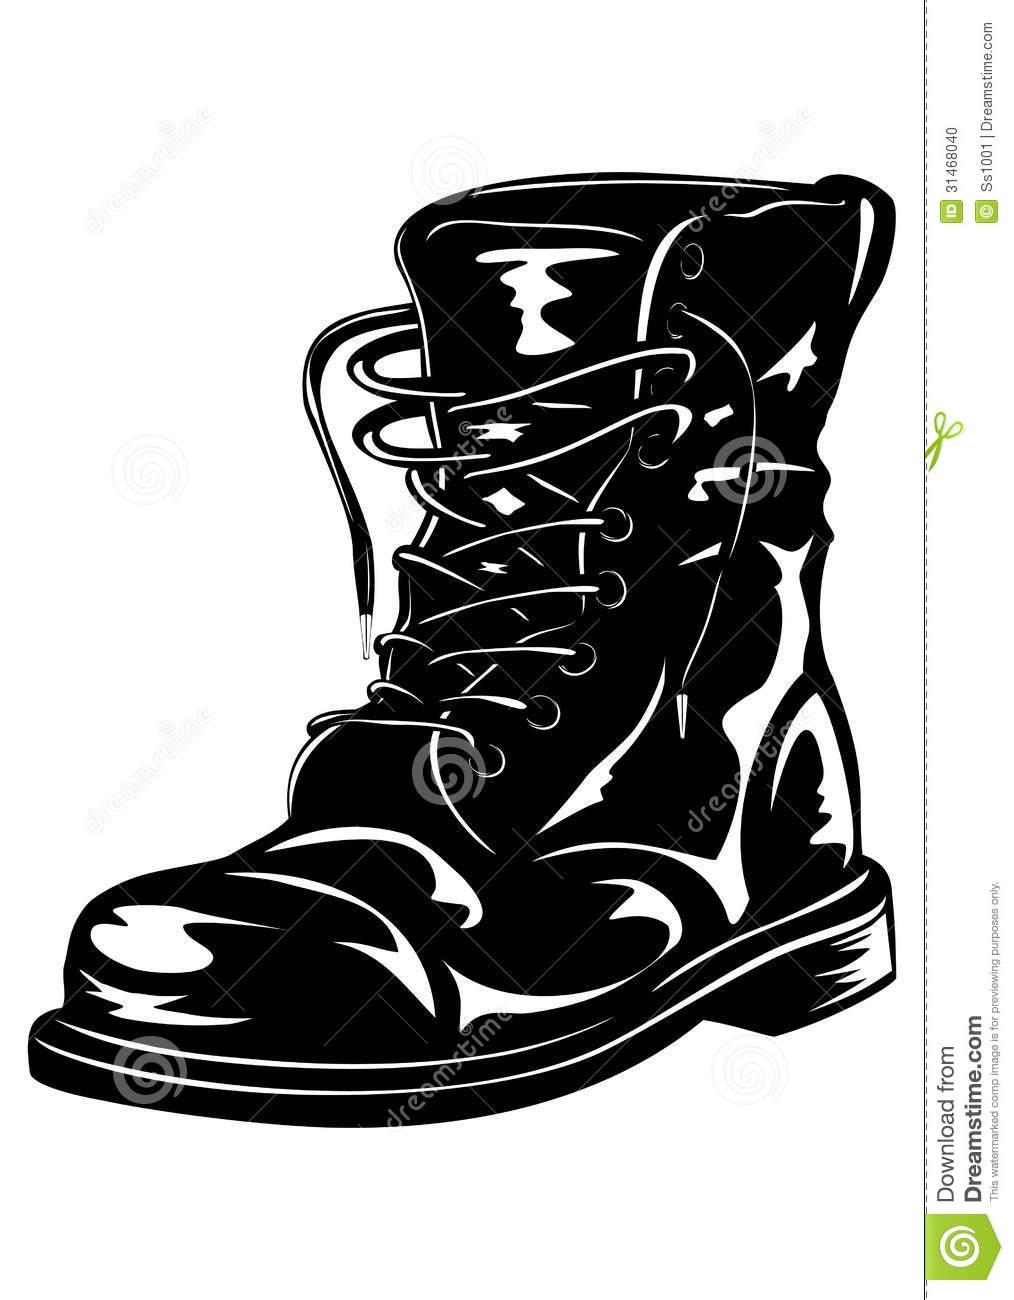 Combat boots clipart 5 » Clipart Station.